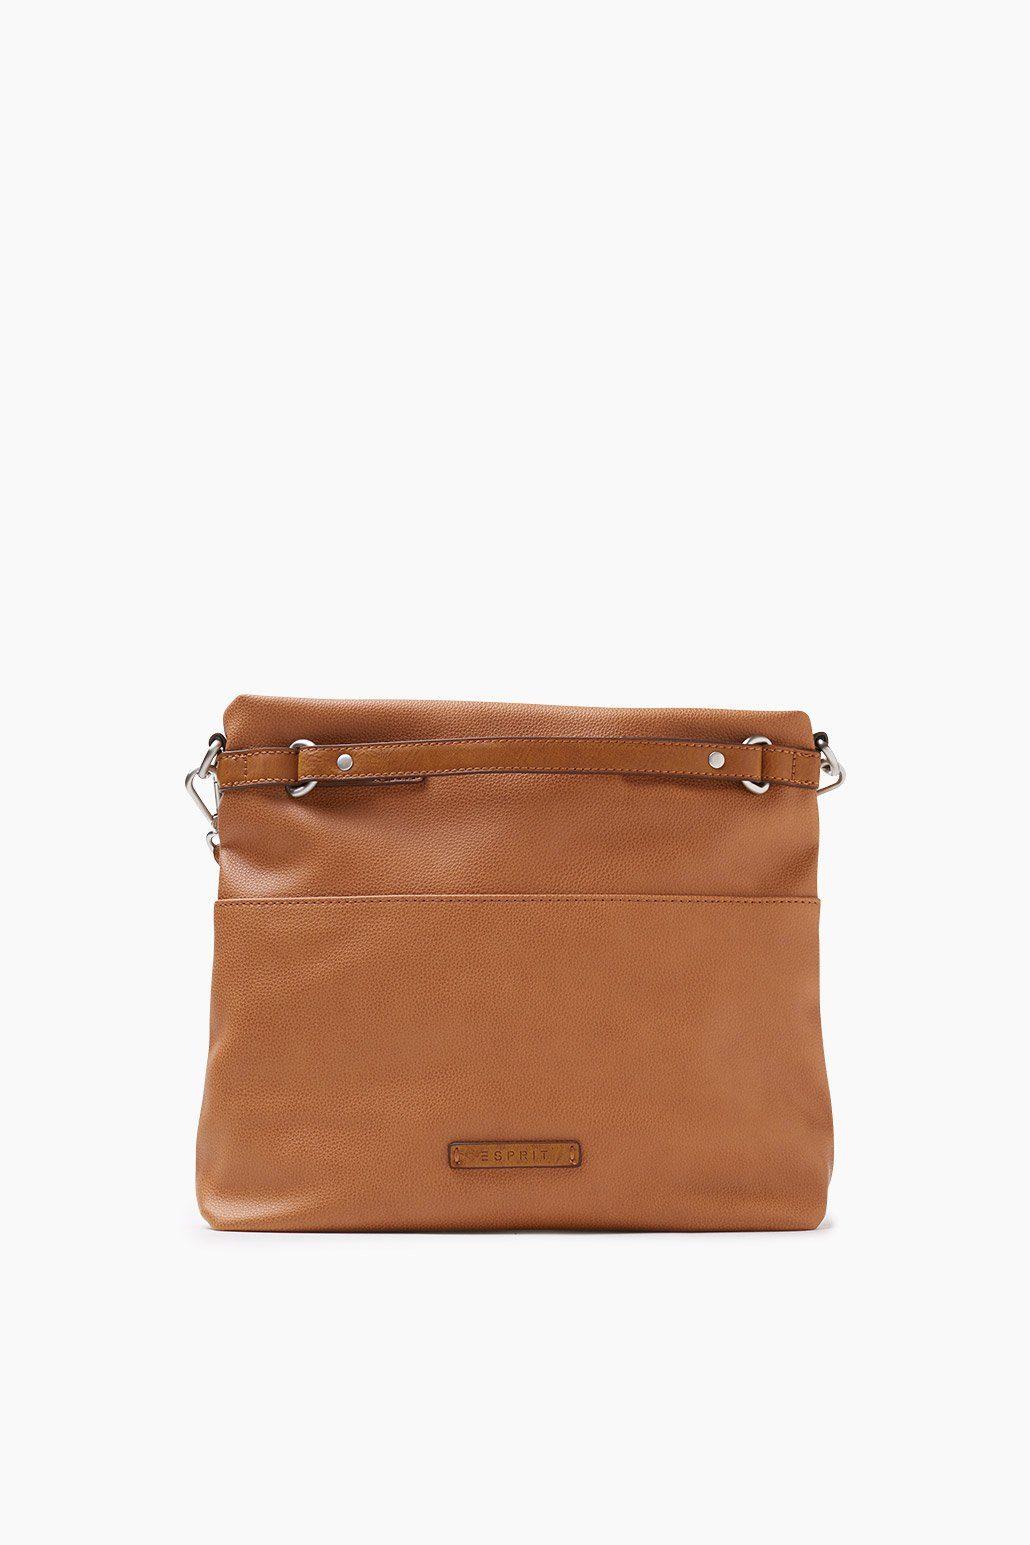 ESPRIT CASUAL Softe Tote Bag in Lederoptik